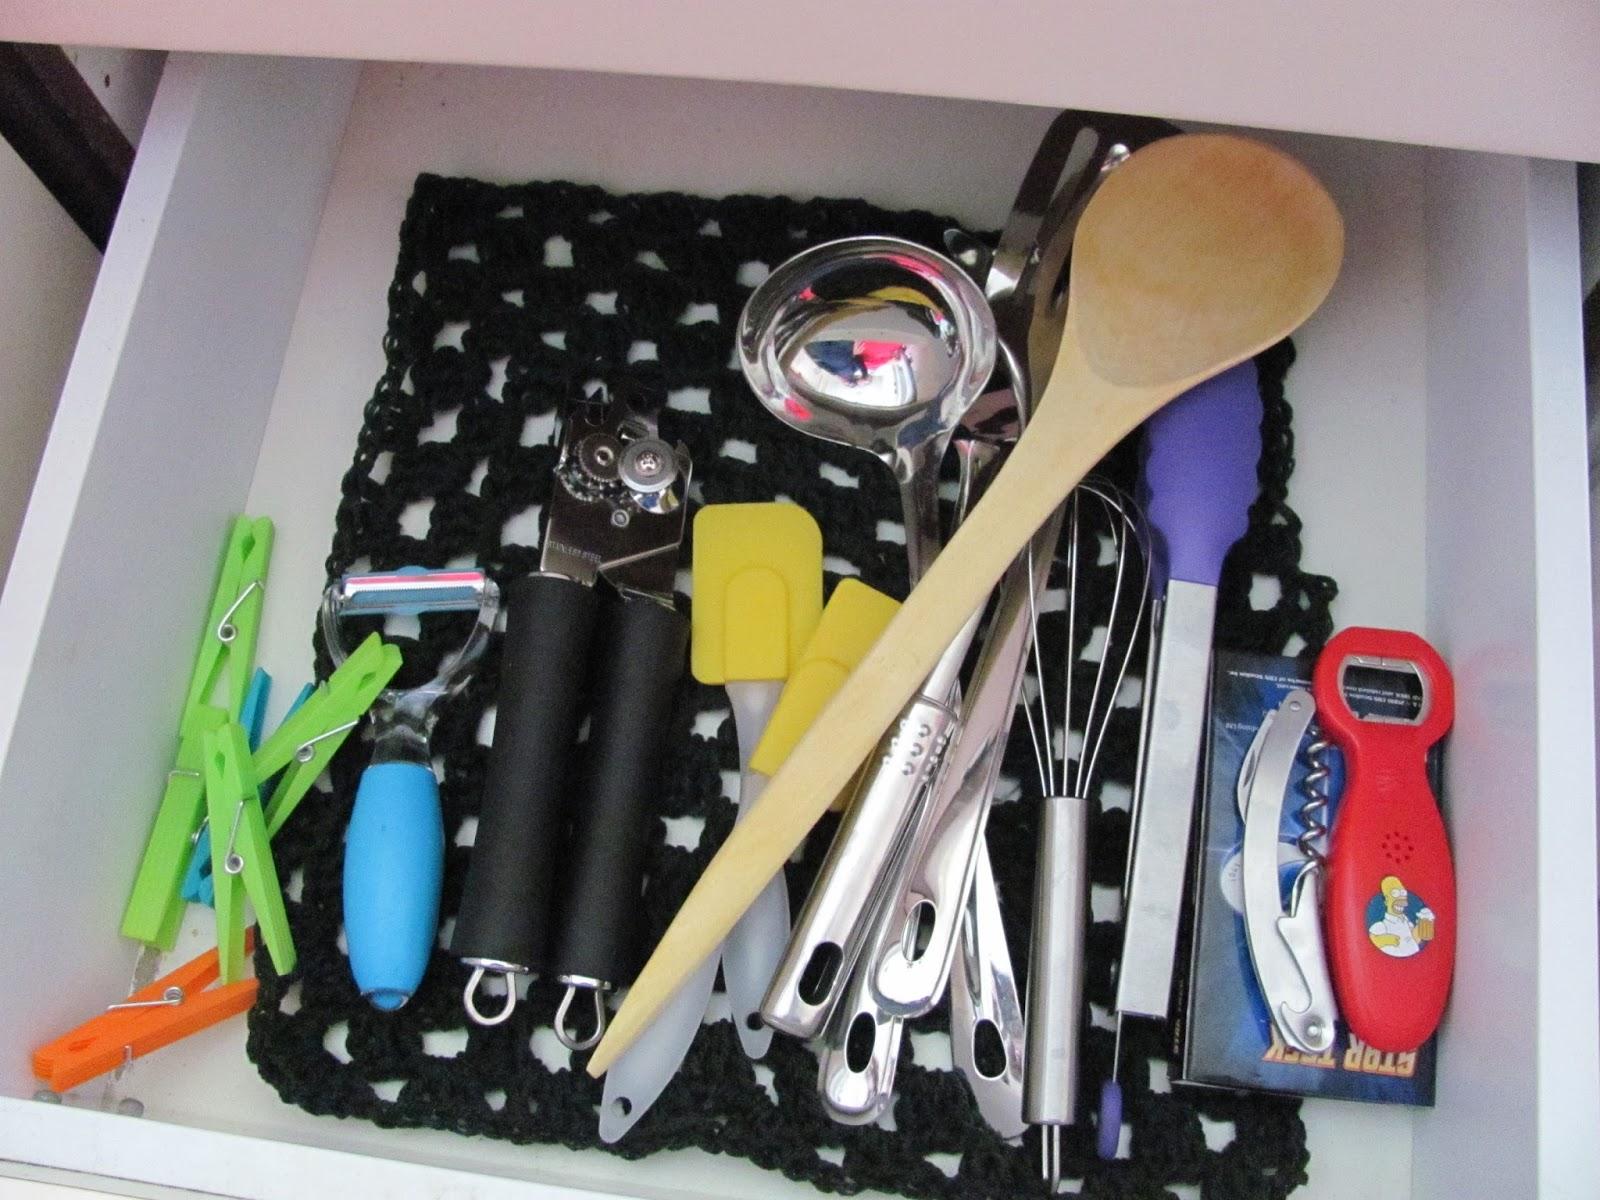 Homemade drawer liner with kitchen utensils in our Dublin, Ireland kitchen